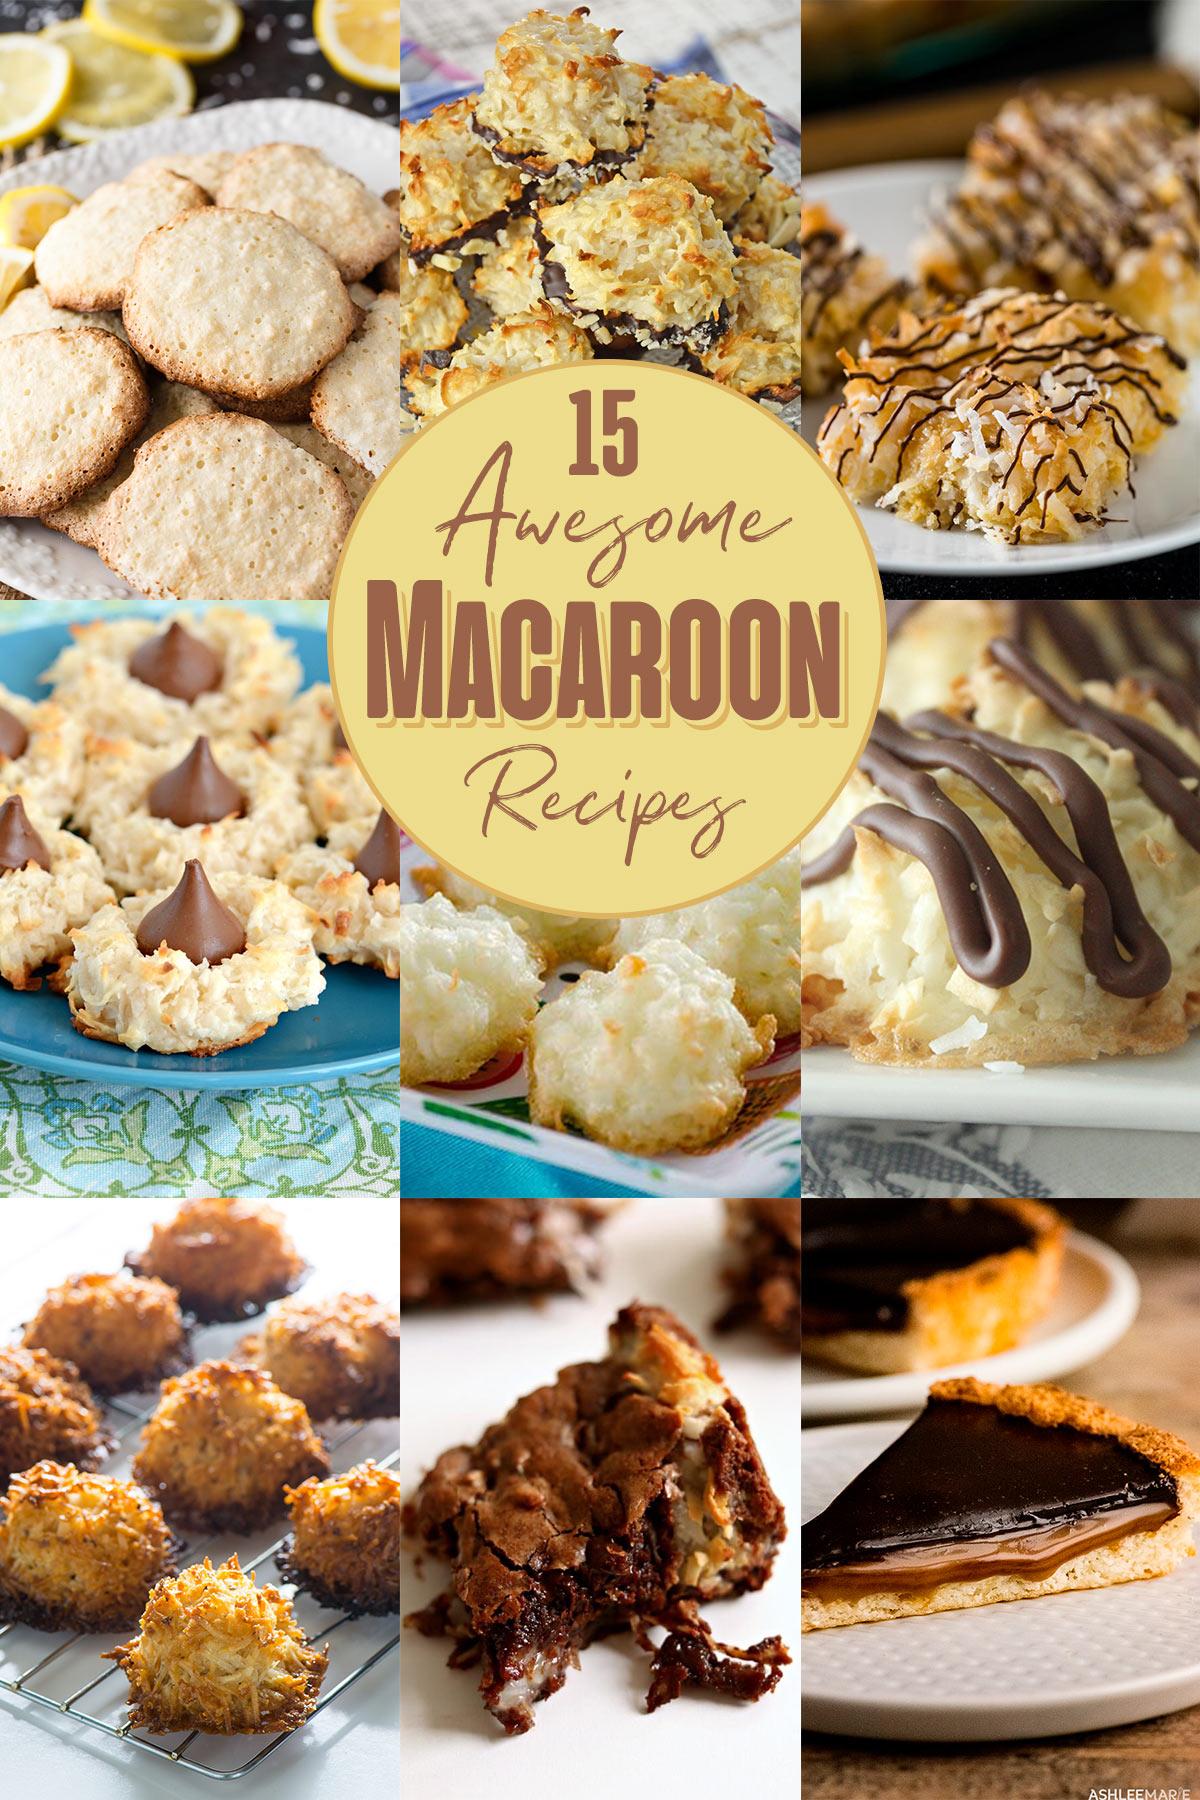 15 Awesome Macaroon Recipes | realmomkitchen.com #nationalmacaroonday